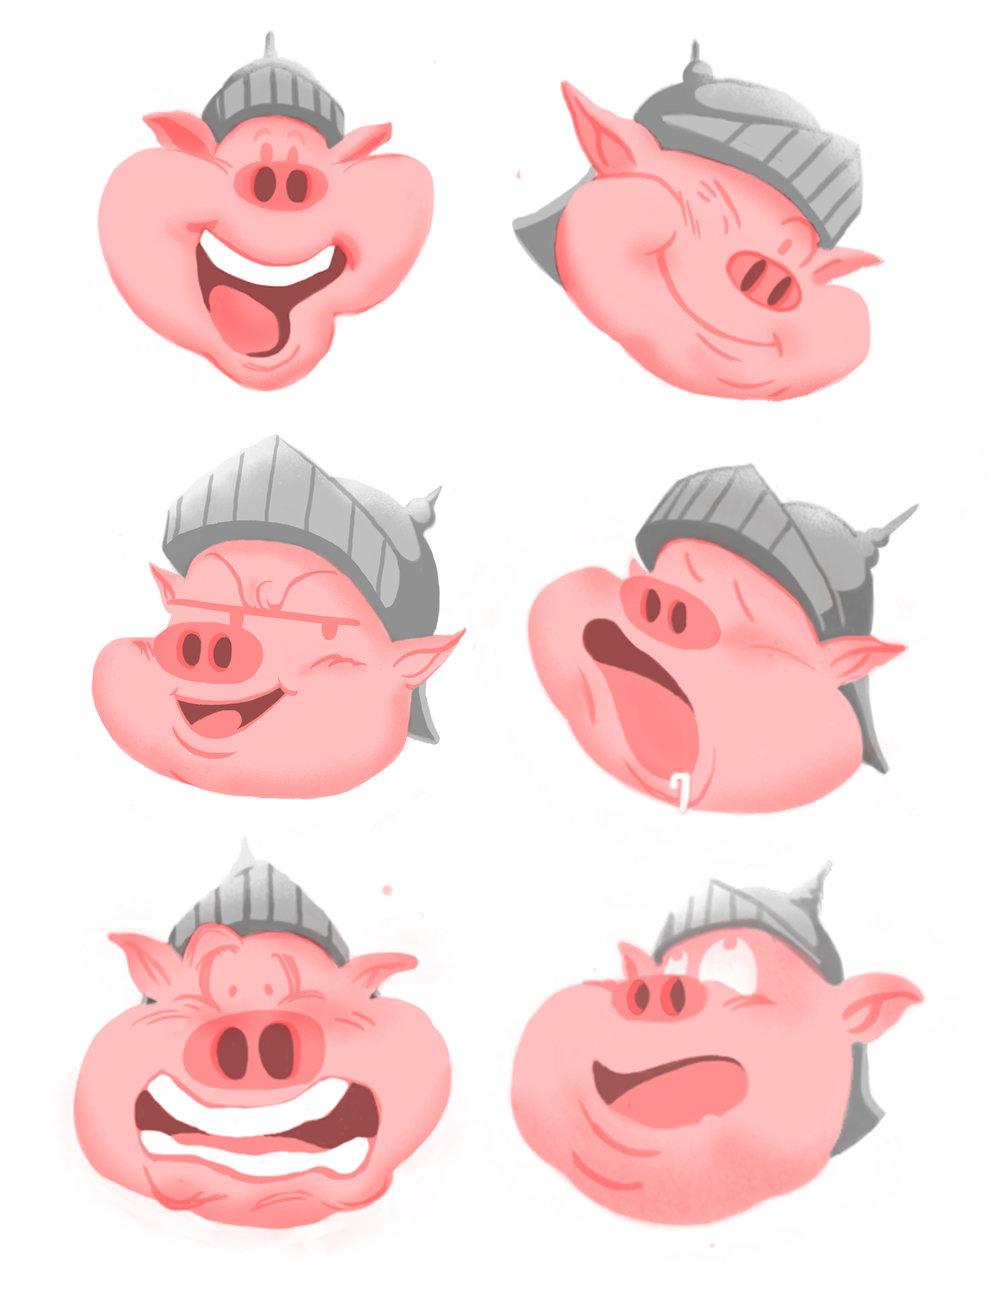 Pig Emoji final sheet.jpg